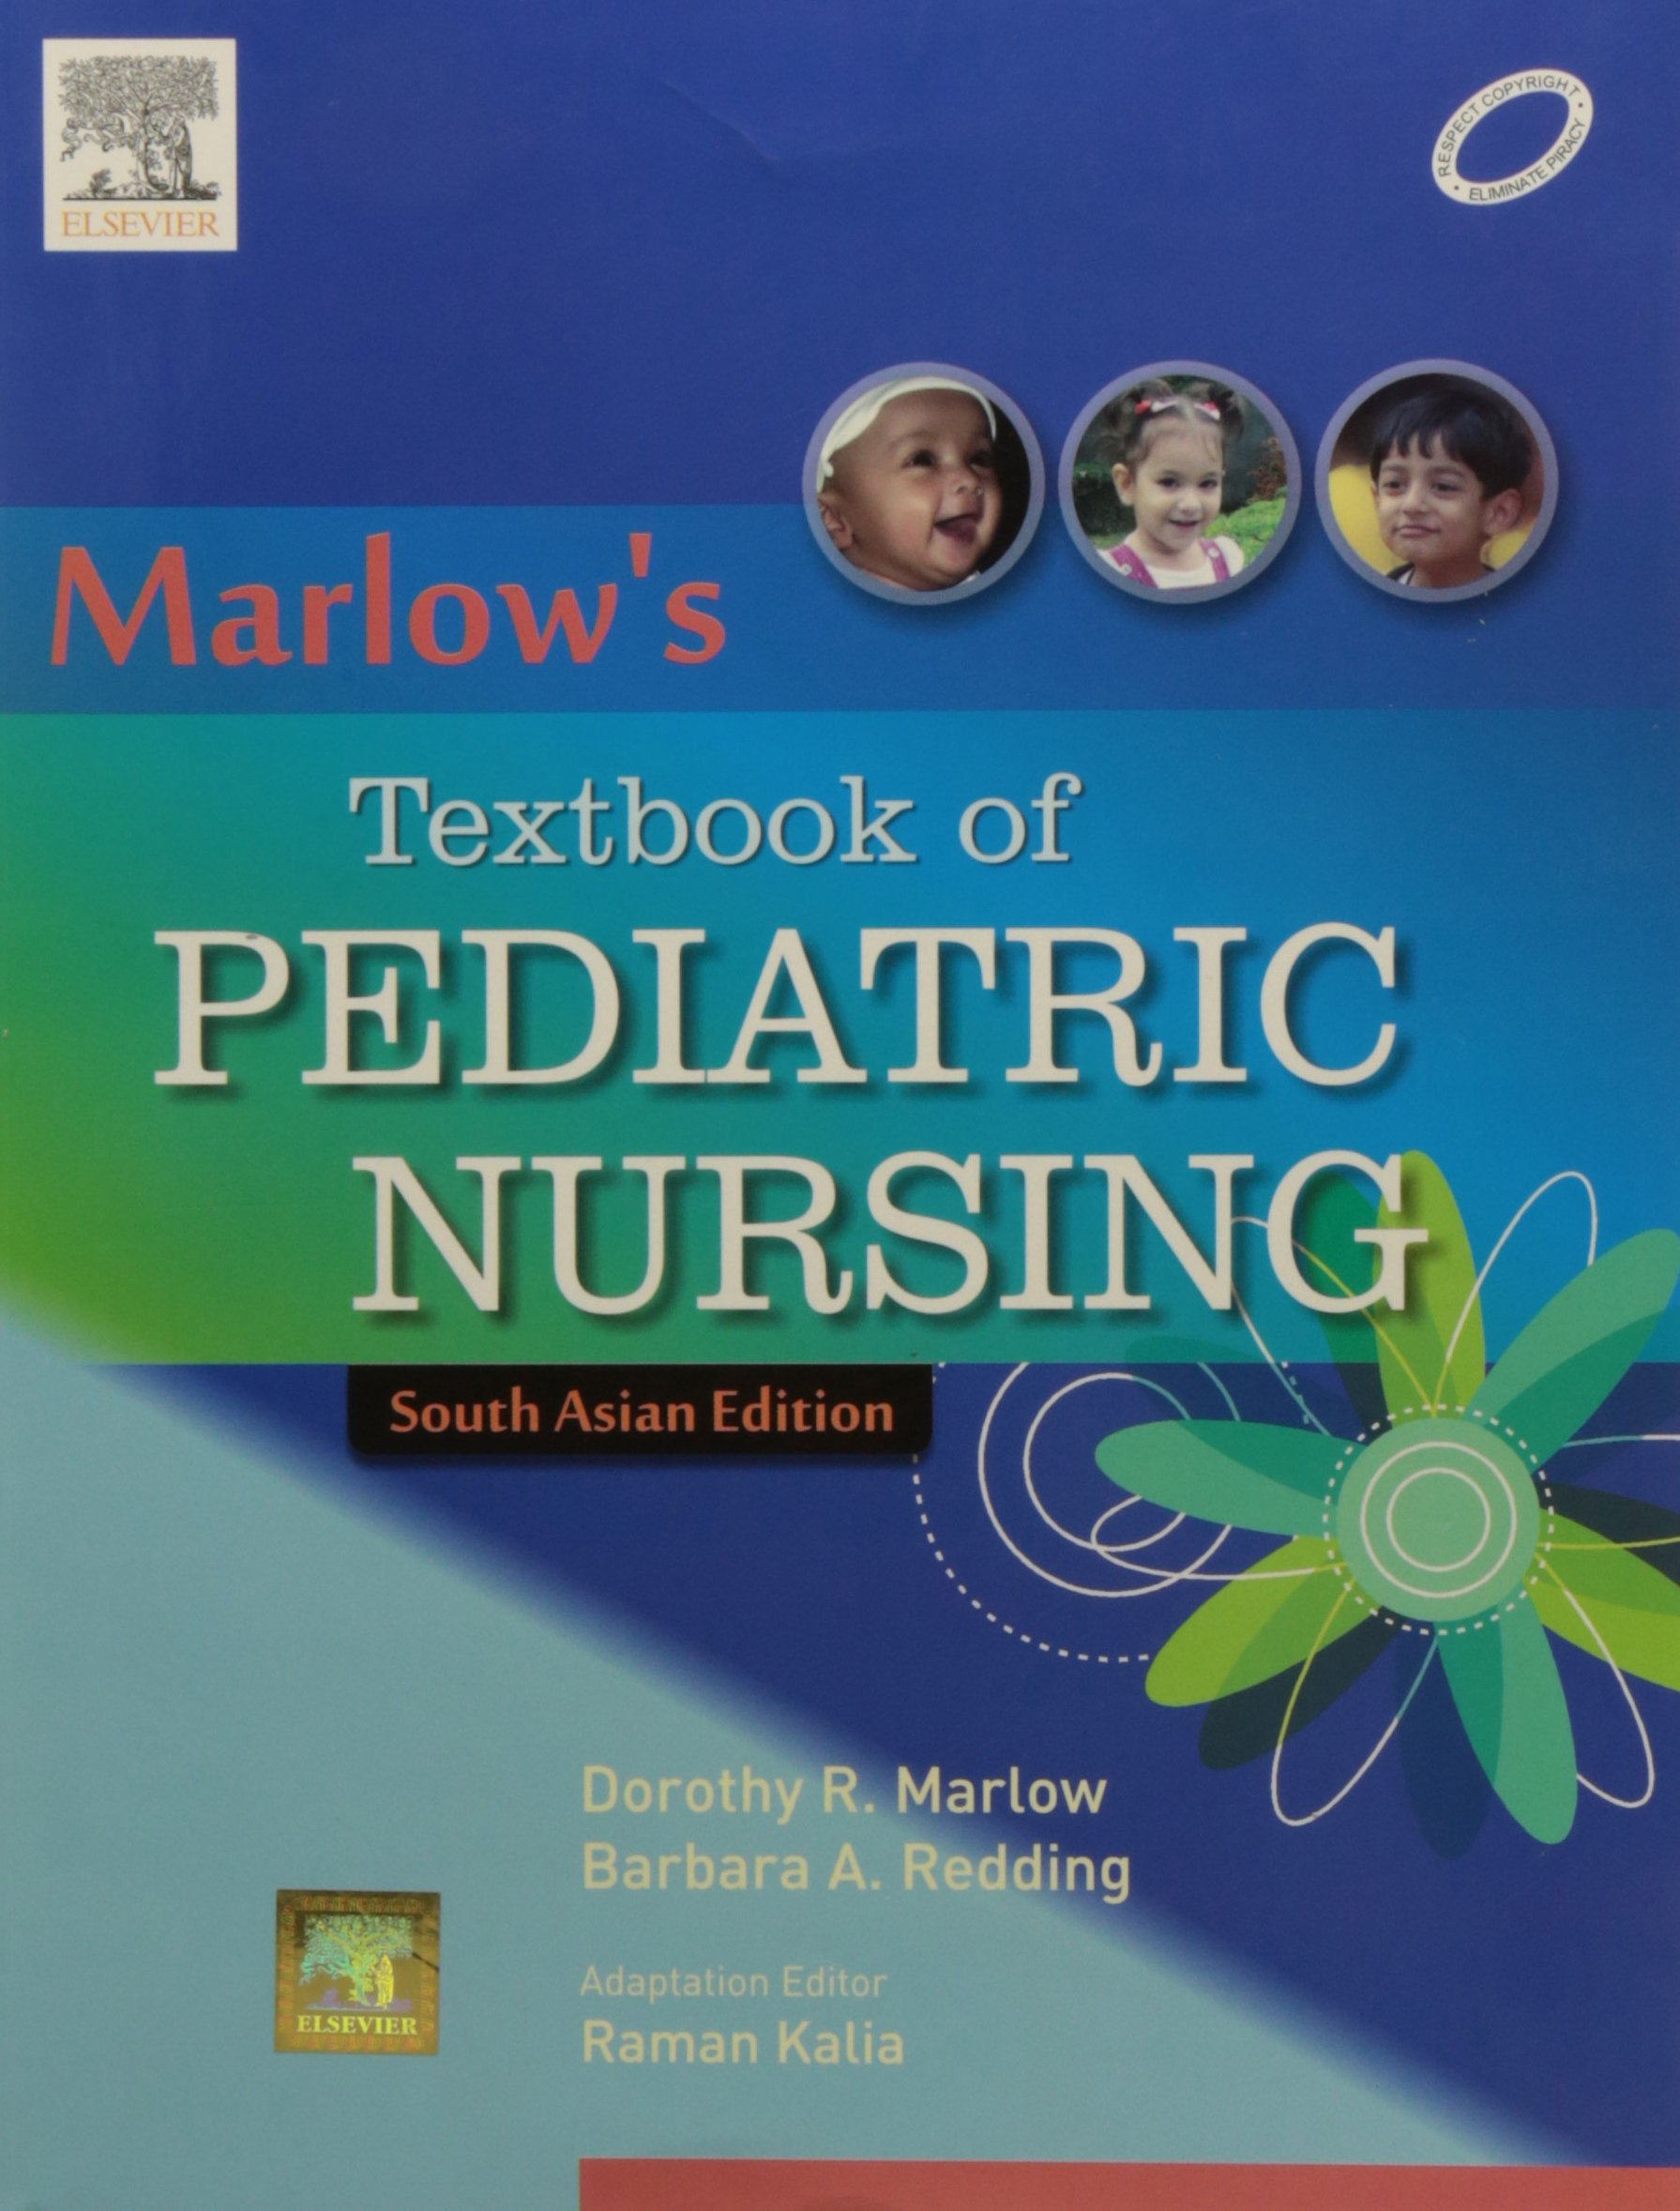 Pediatrics And Pediatric Nursing Ebook Kawasaki Klr650 Color Wiring Diagram Xe May Honda Vision 2015 View Array Buy Marlow U0027s Textbook Of Adapted For South Asian Rh Amazon In